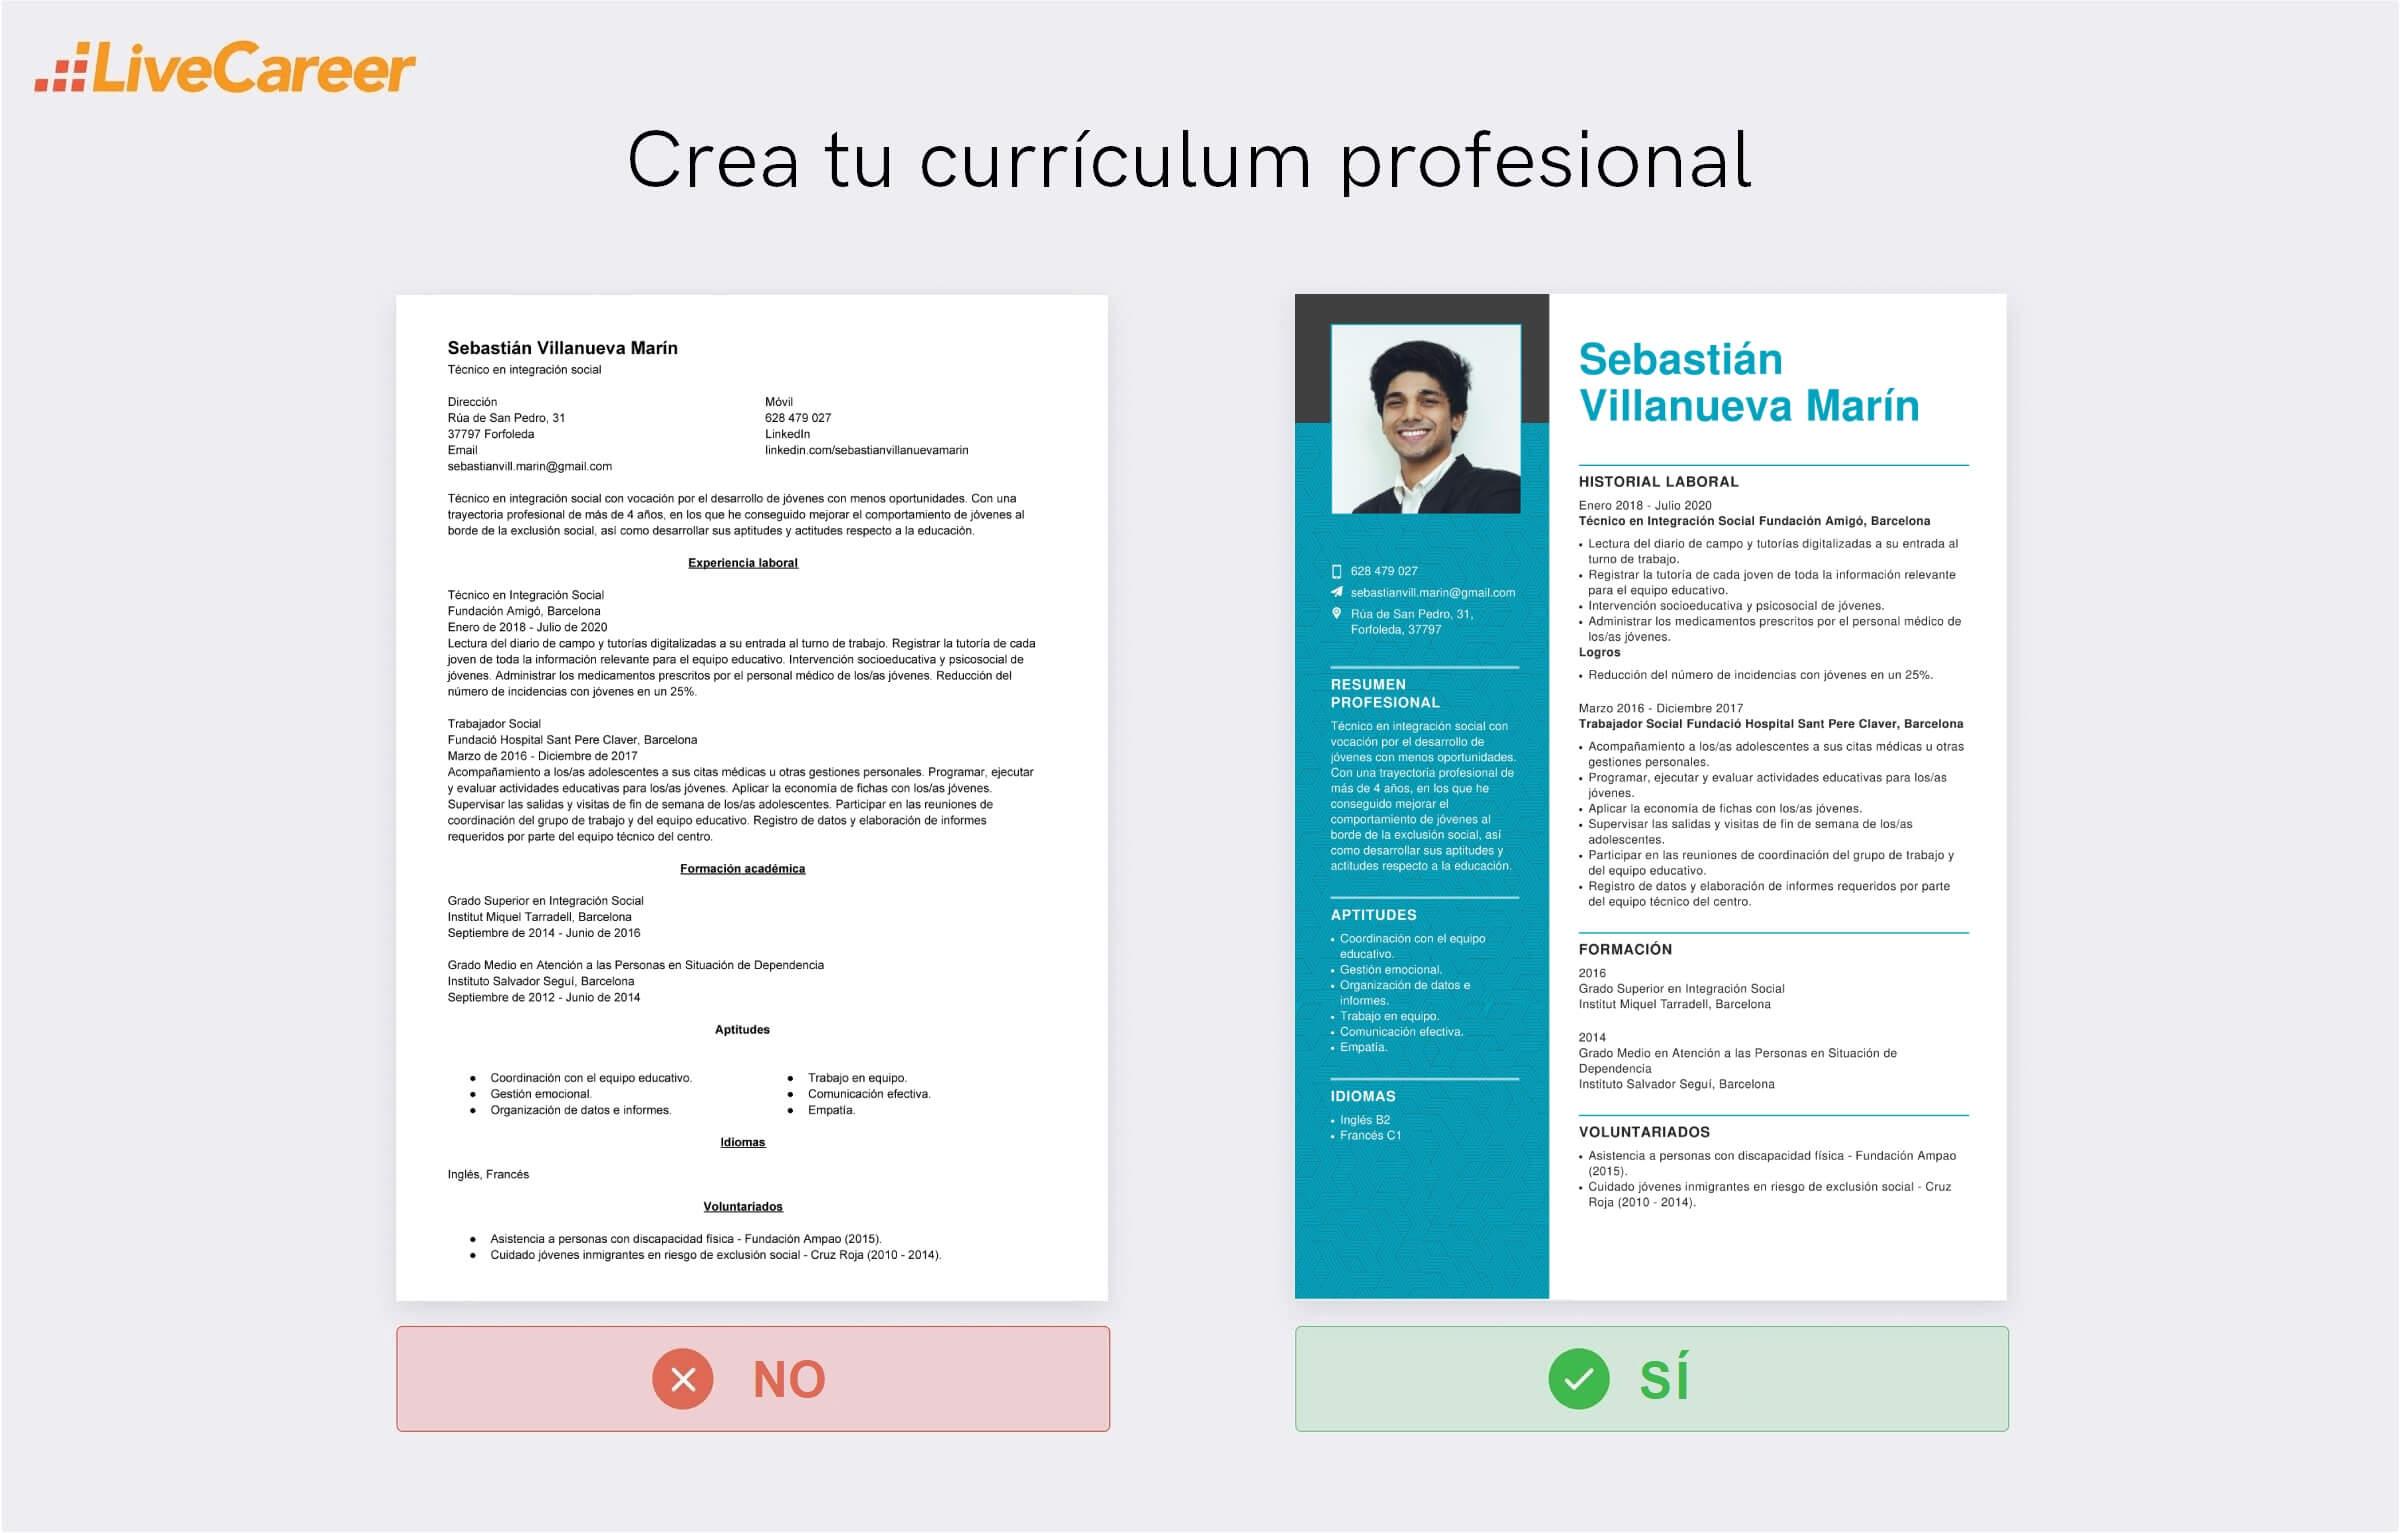 Curriculum vitae de integrador social